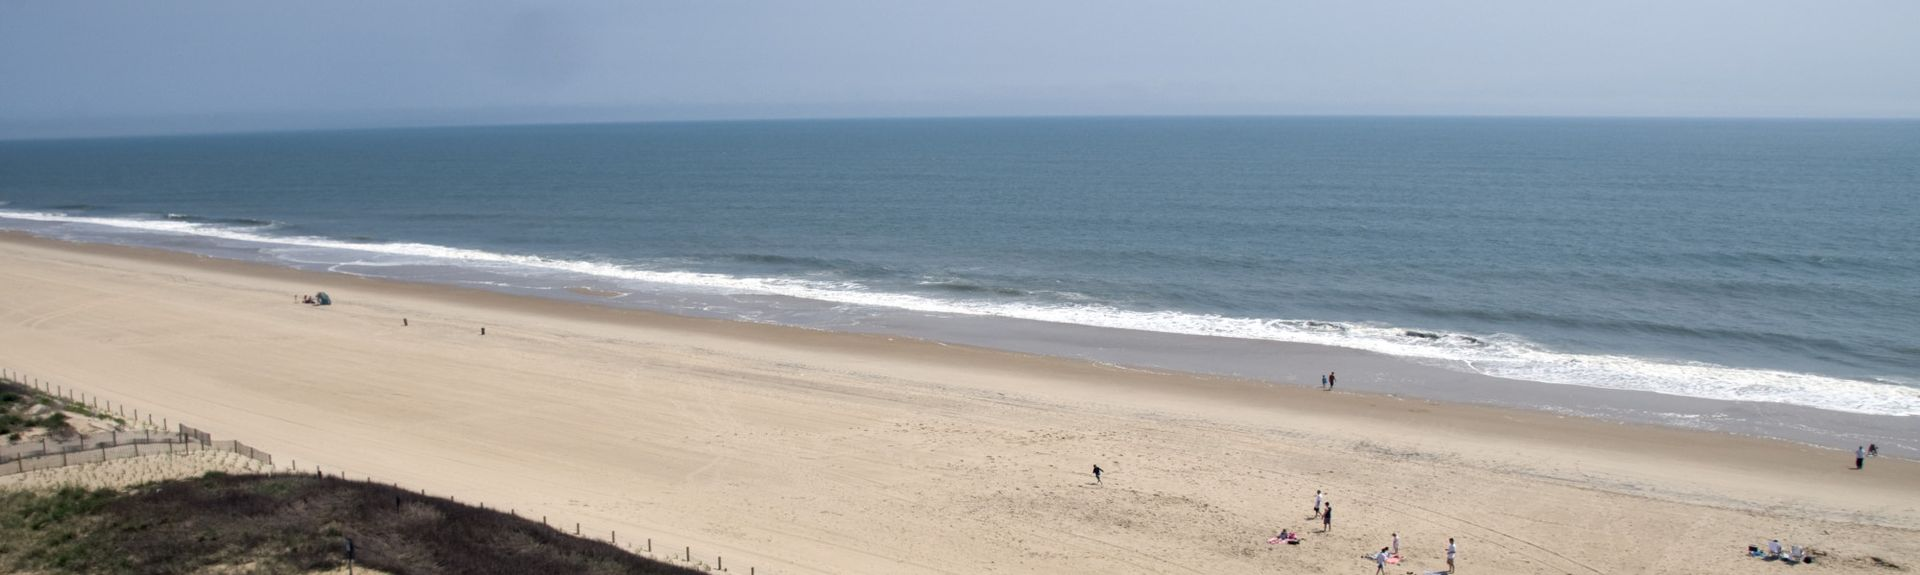 Sandpiper Dunes (Ocean City, Maryland, États-Unis d'Amérique)